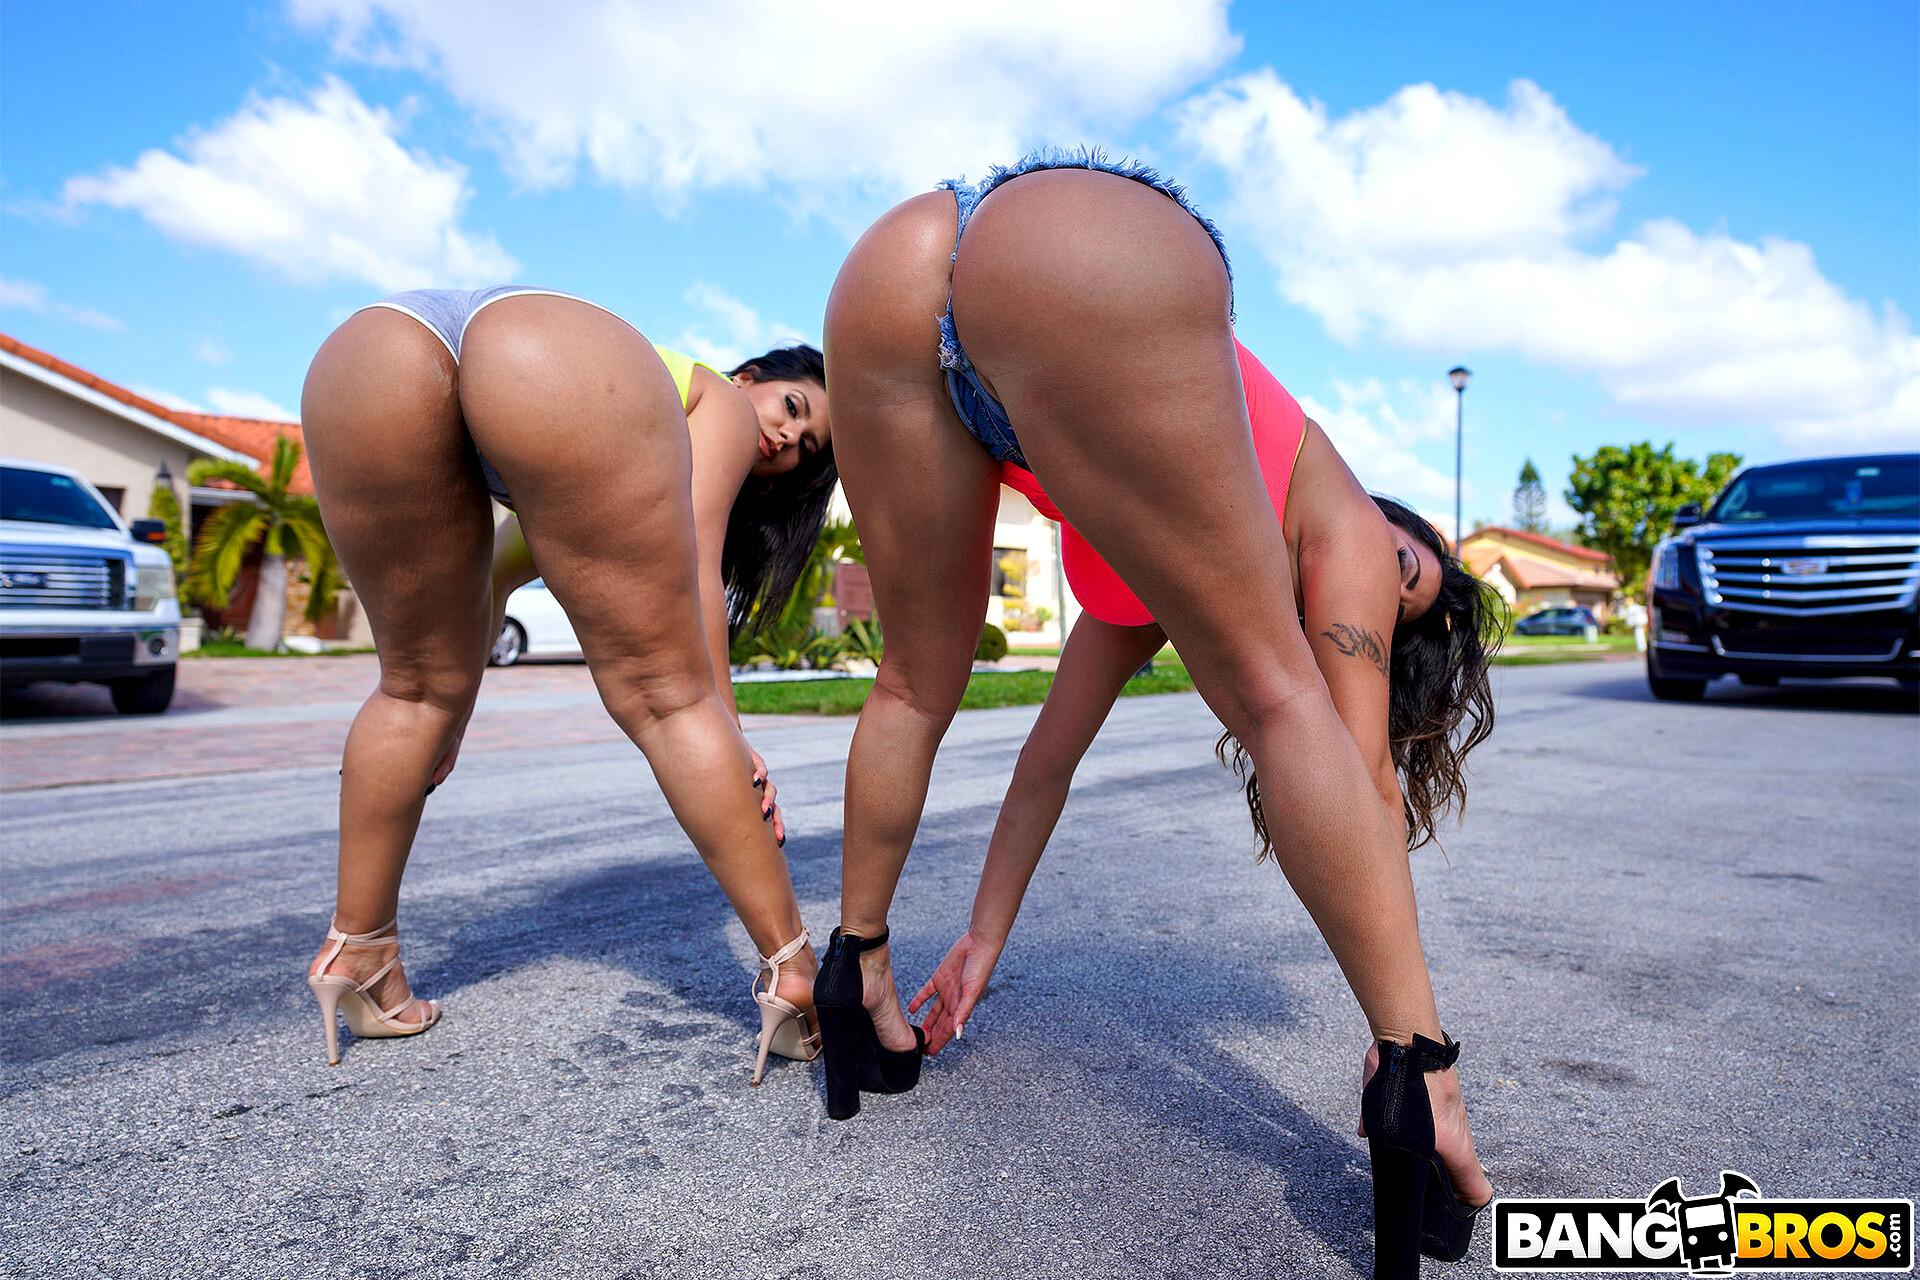 Brazilian Webstripper Striptease So Hot For You Big Booty Teen Shaking Ass